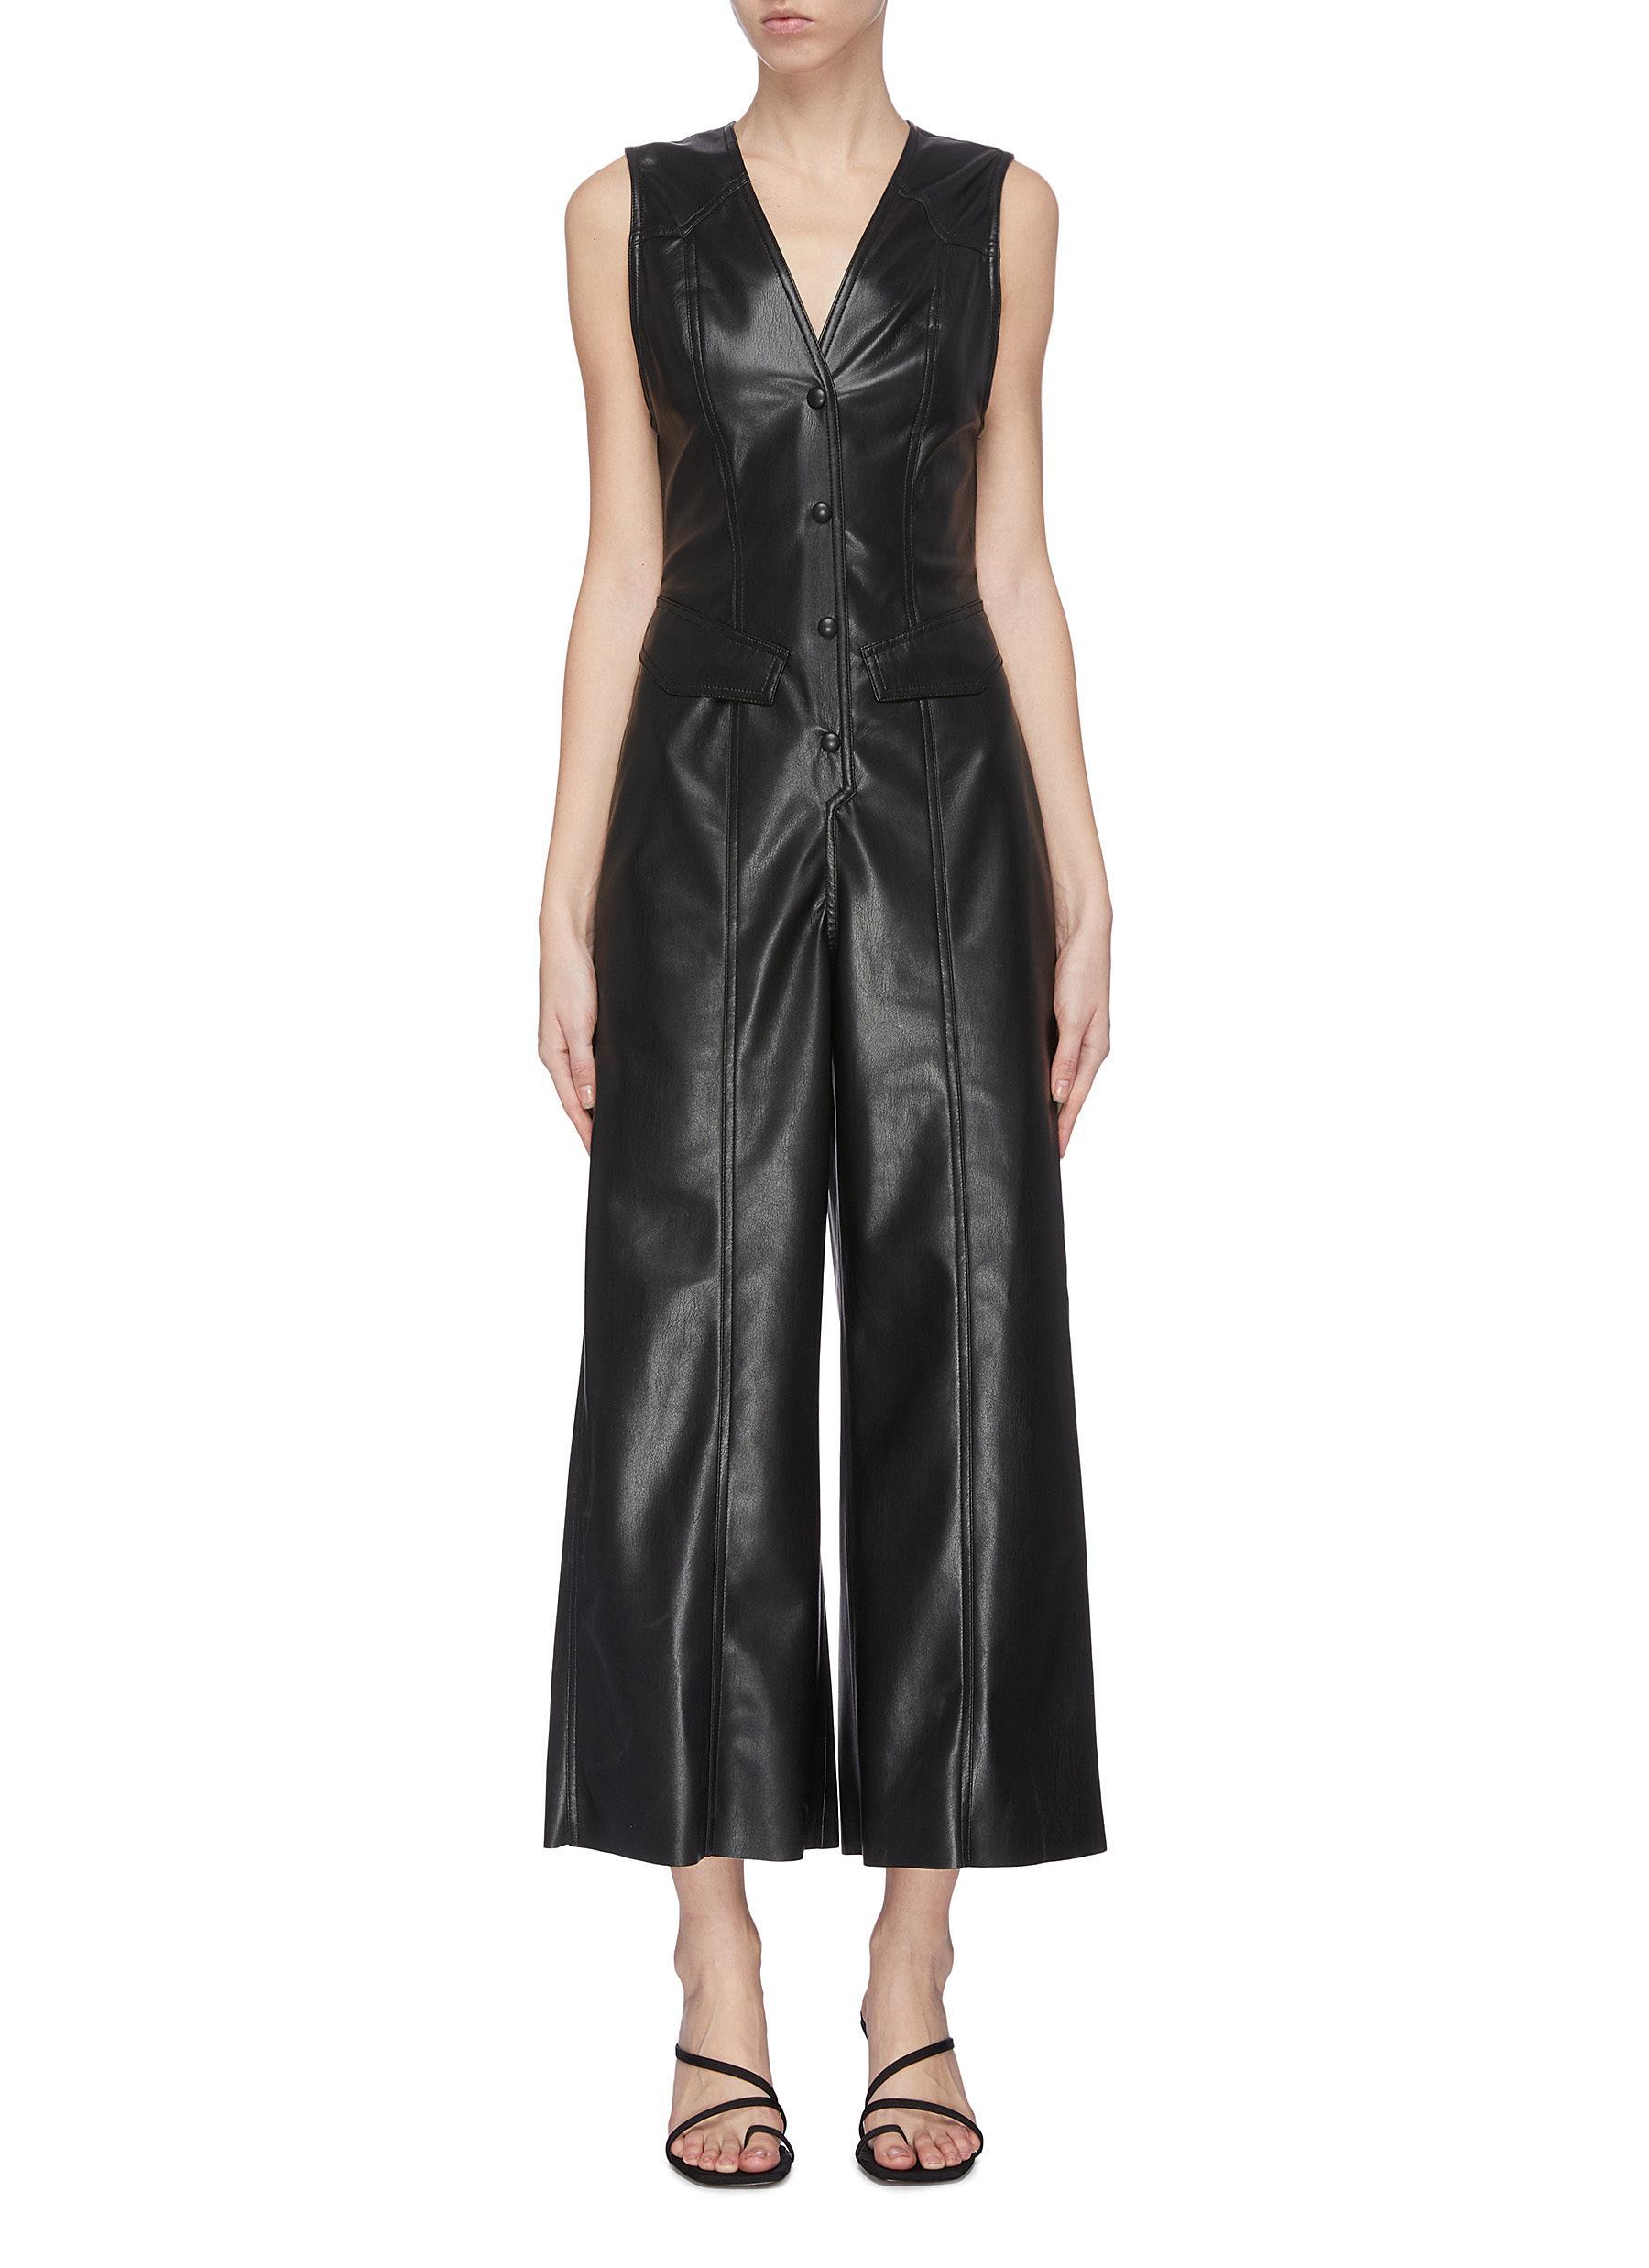 Buy Nanushka Pants & Shorts 'Freya' faux leather jumpsuit